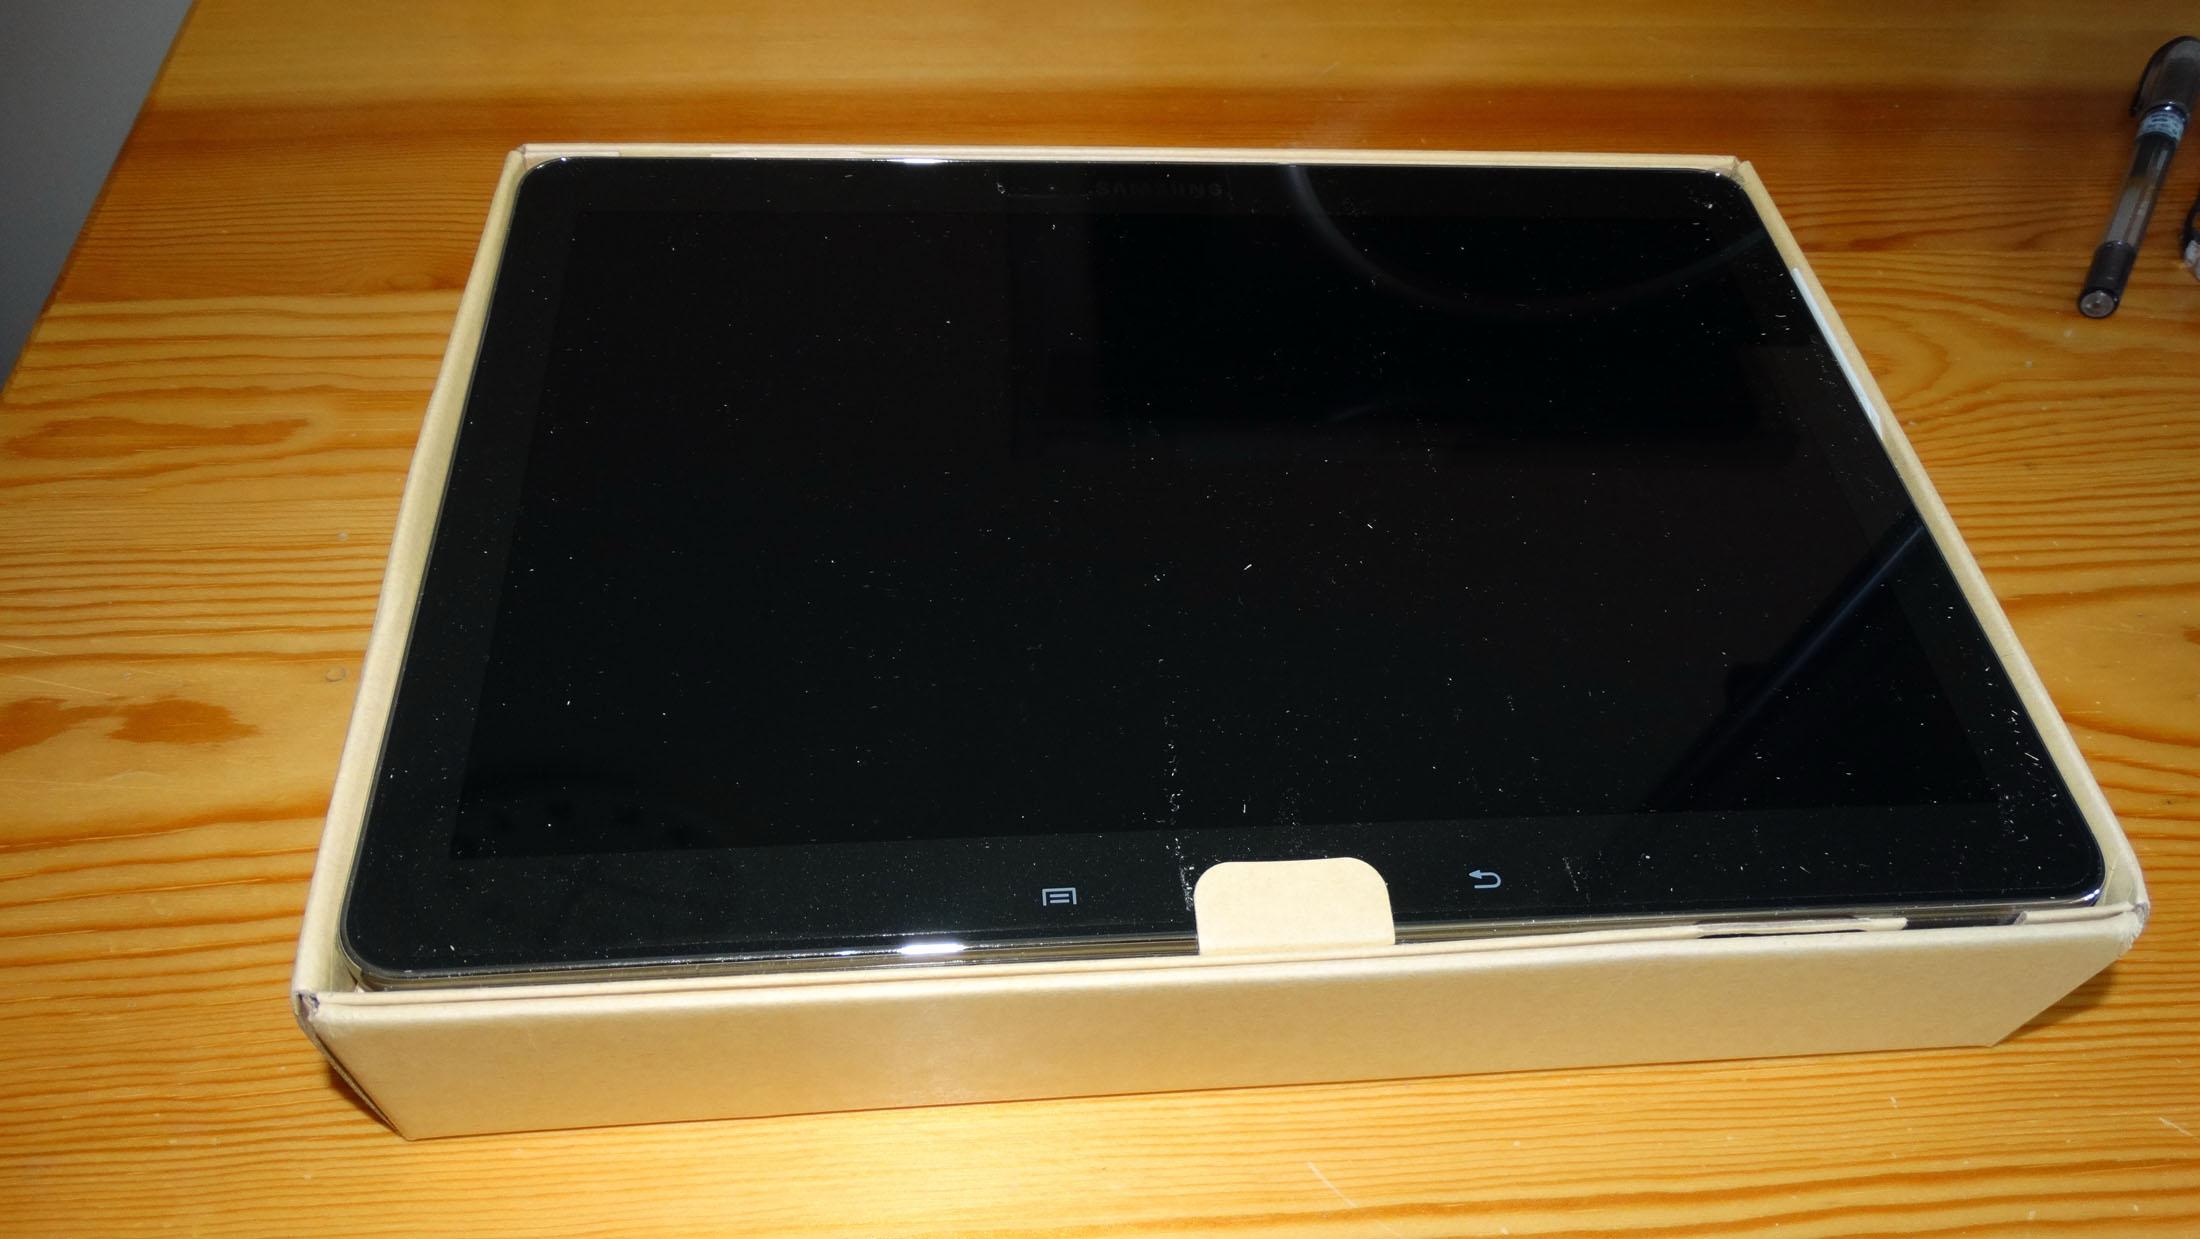 1 2014 edition p601 点评  还不错的平板电脑,主要用来通过otg将数码